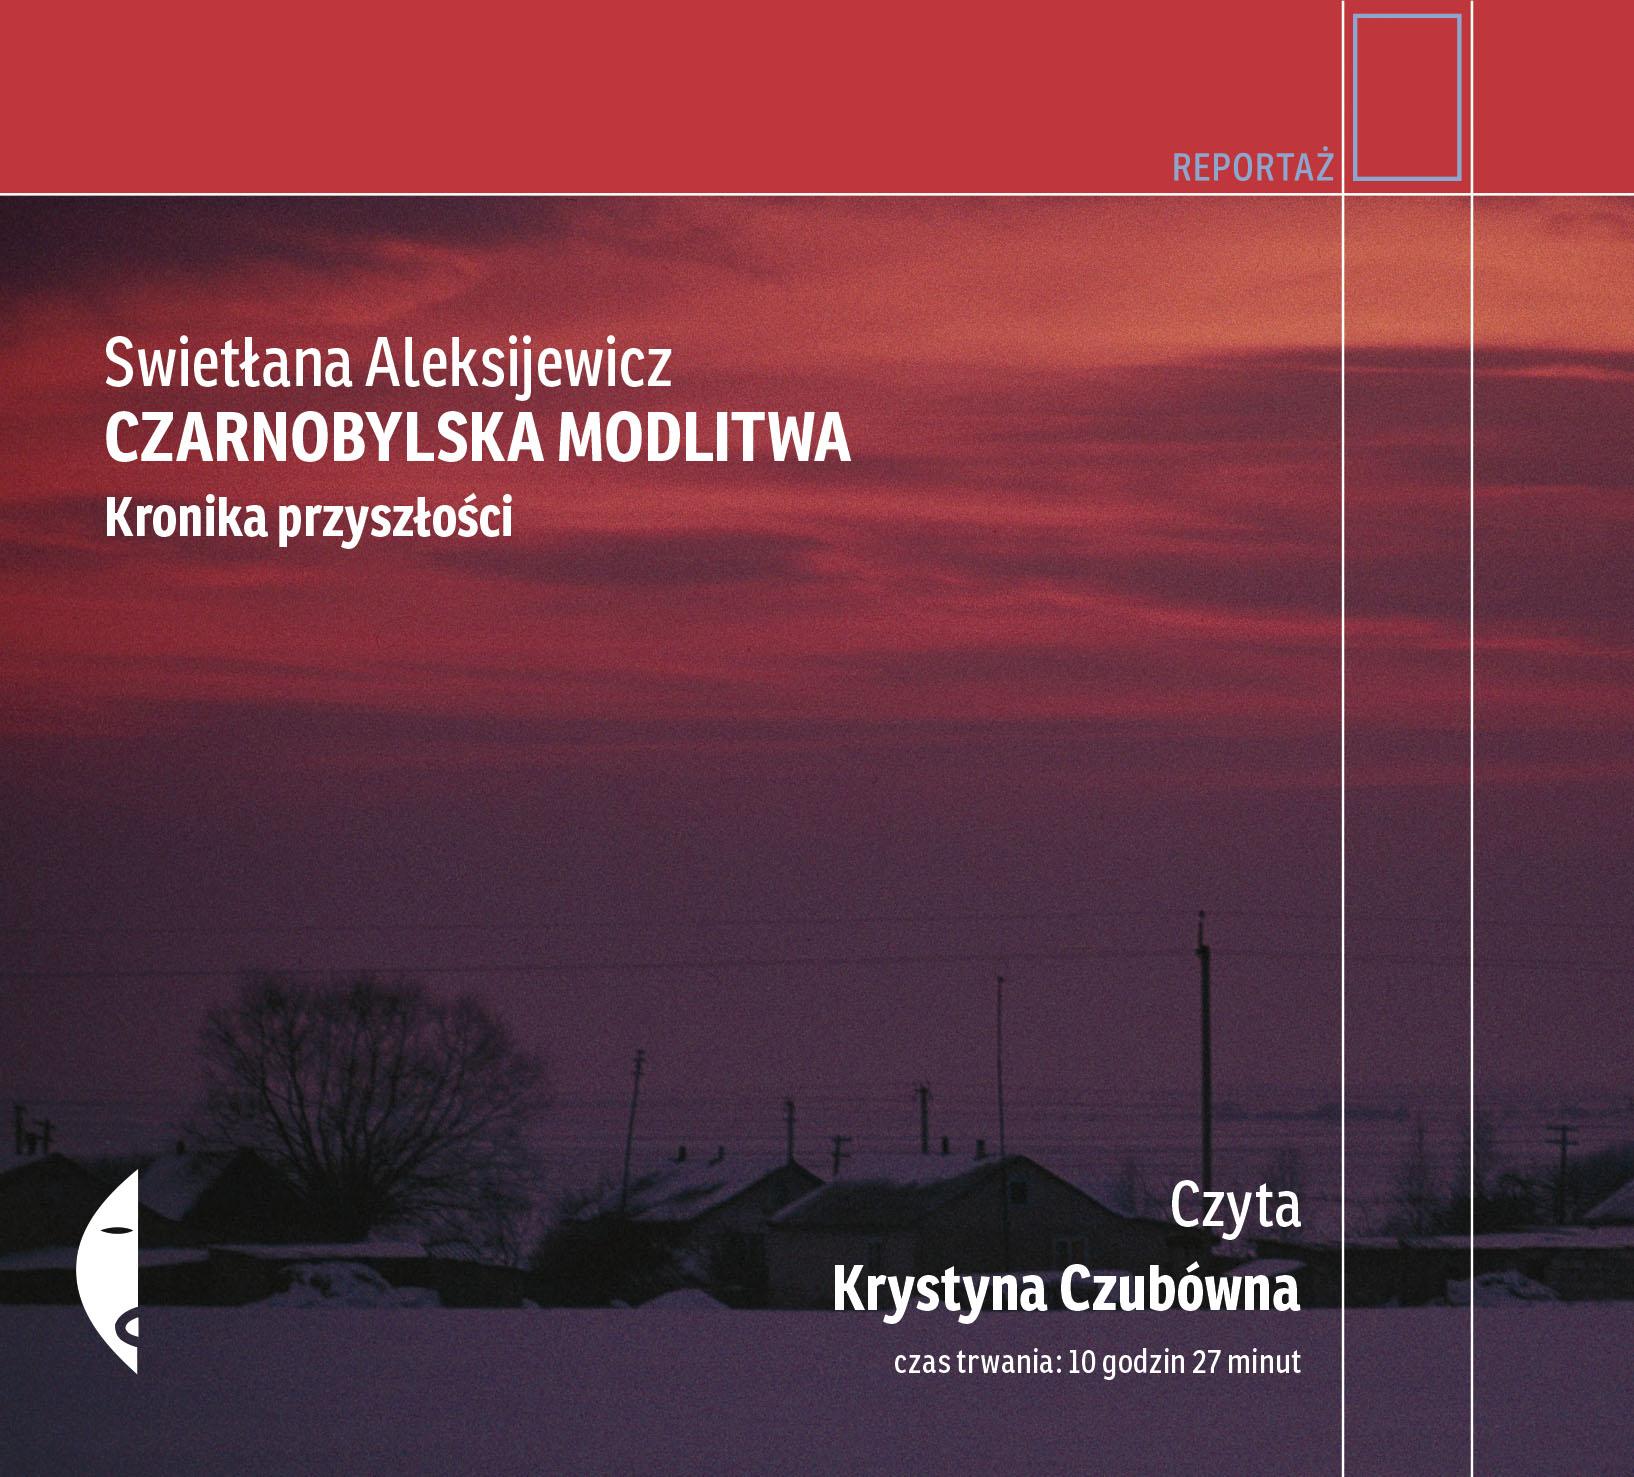 CD MP3 Czarnobylska modlitwa